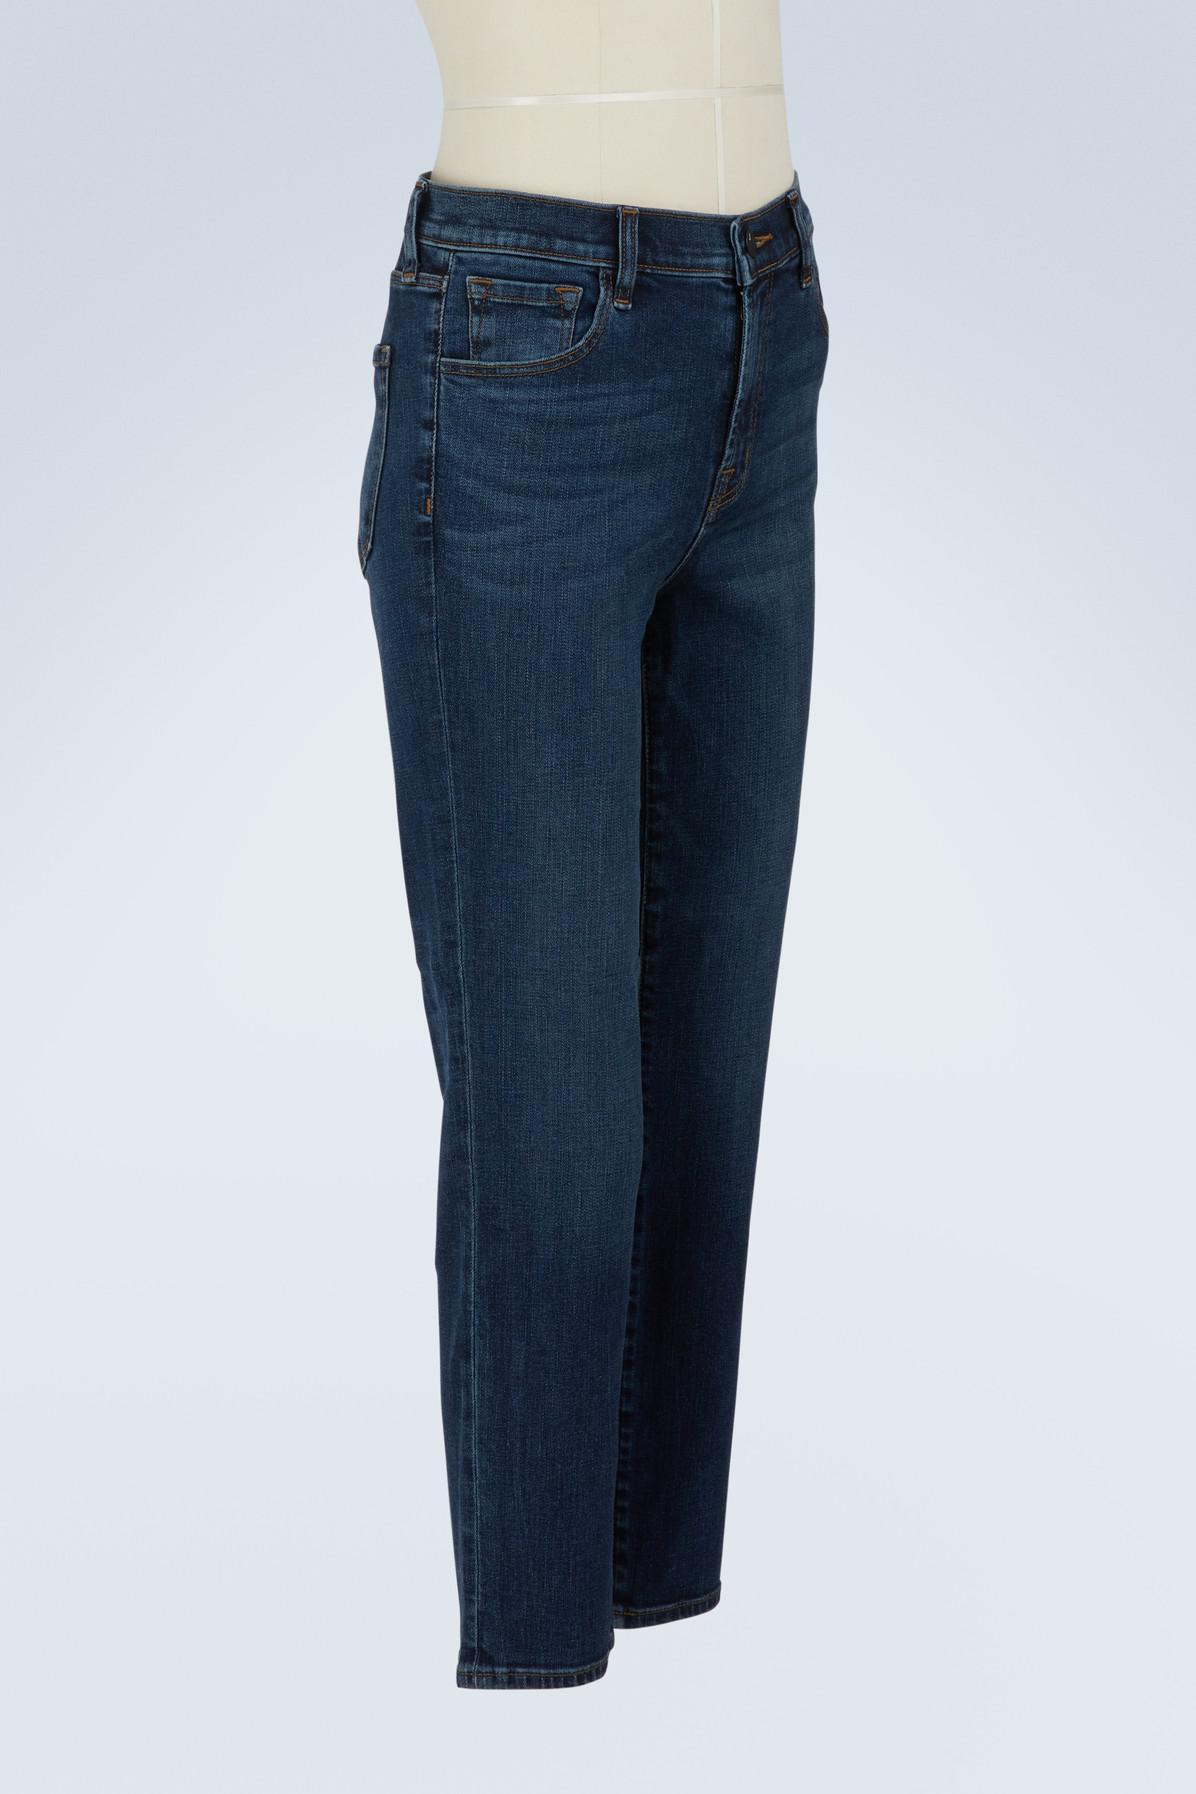 12cd3454fac4 J Brand - Blue Ruby High-rise Cropped Cigarette Jeans - Lyst. View  fullscreen